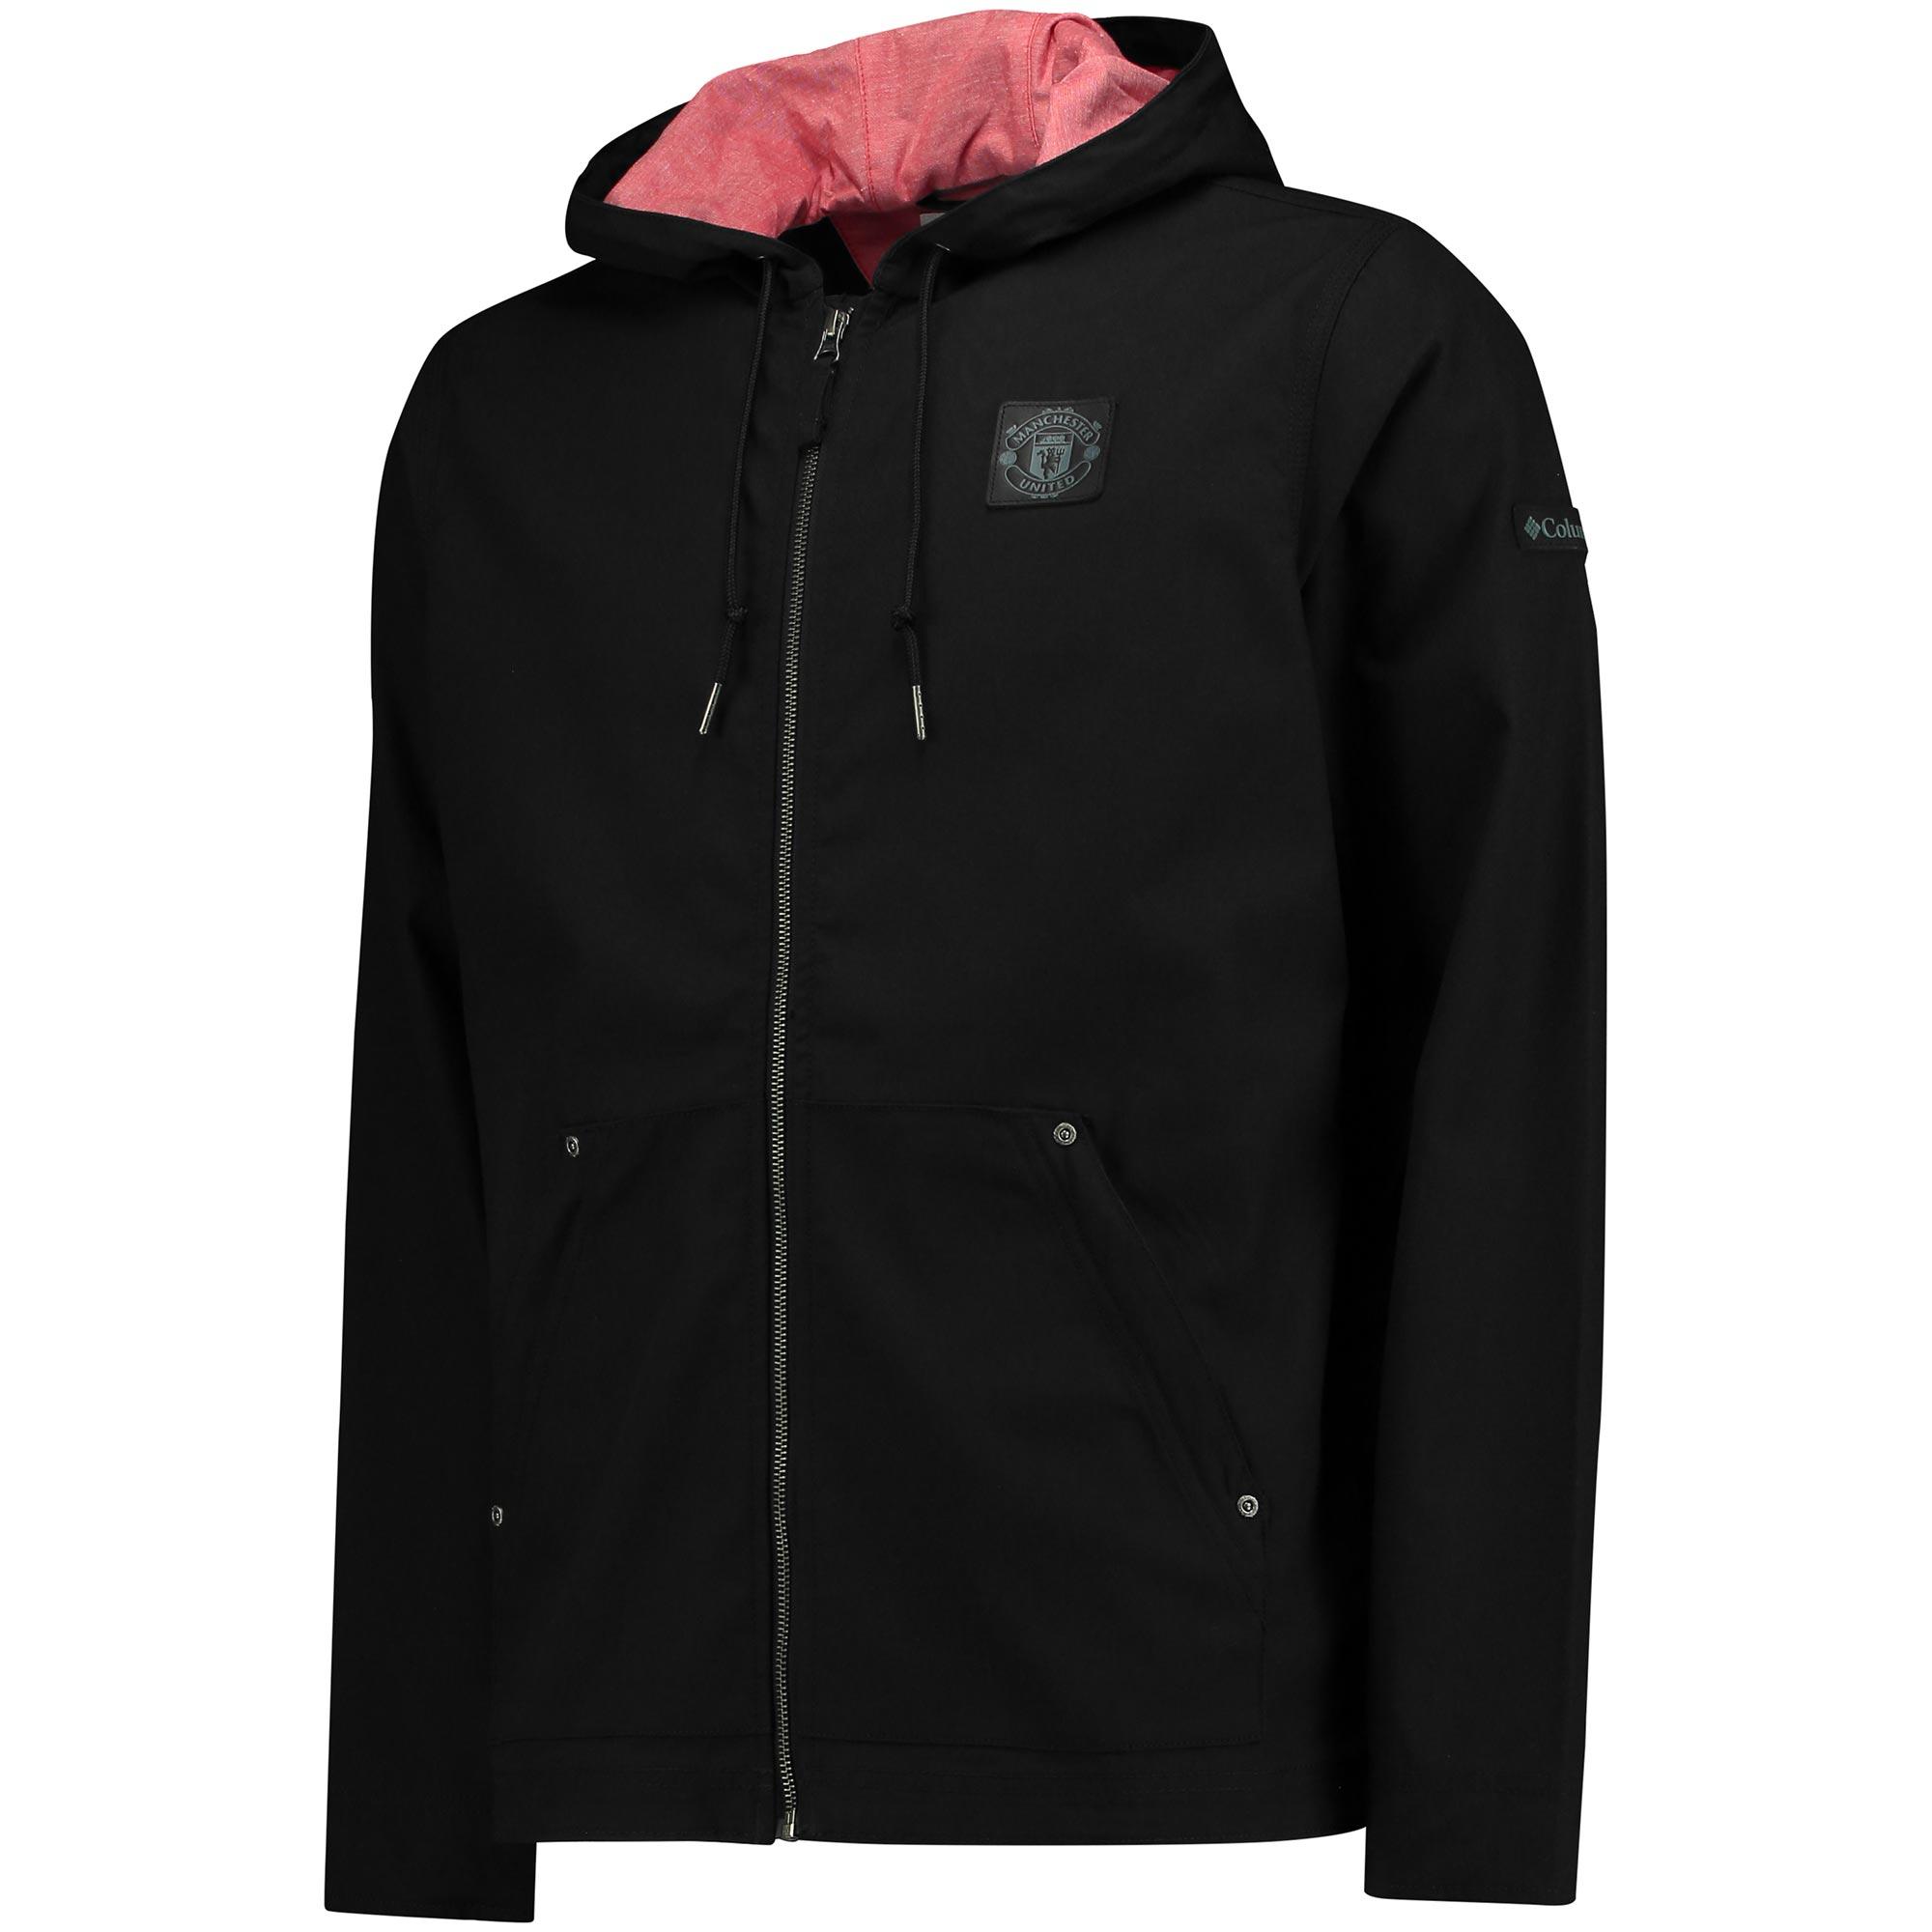 Manchester United Loma Vista Springs Jacket - Black - Mens